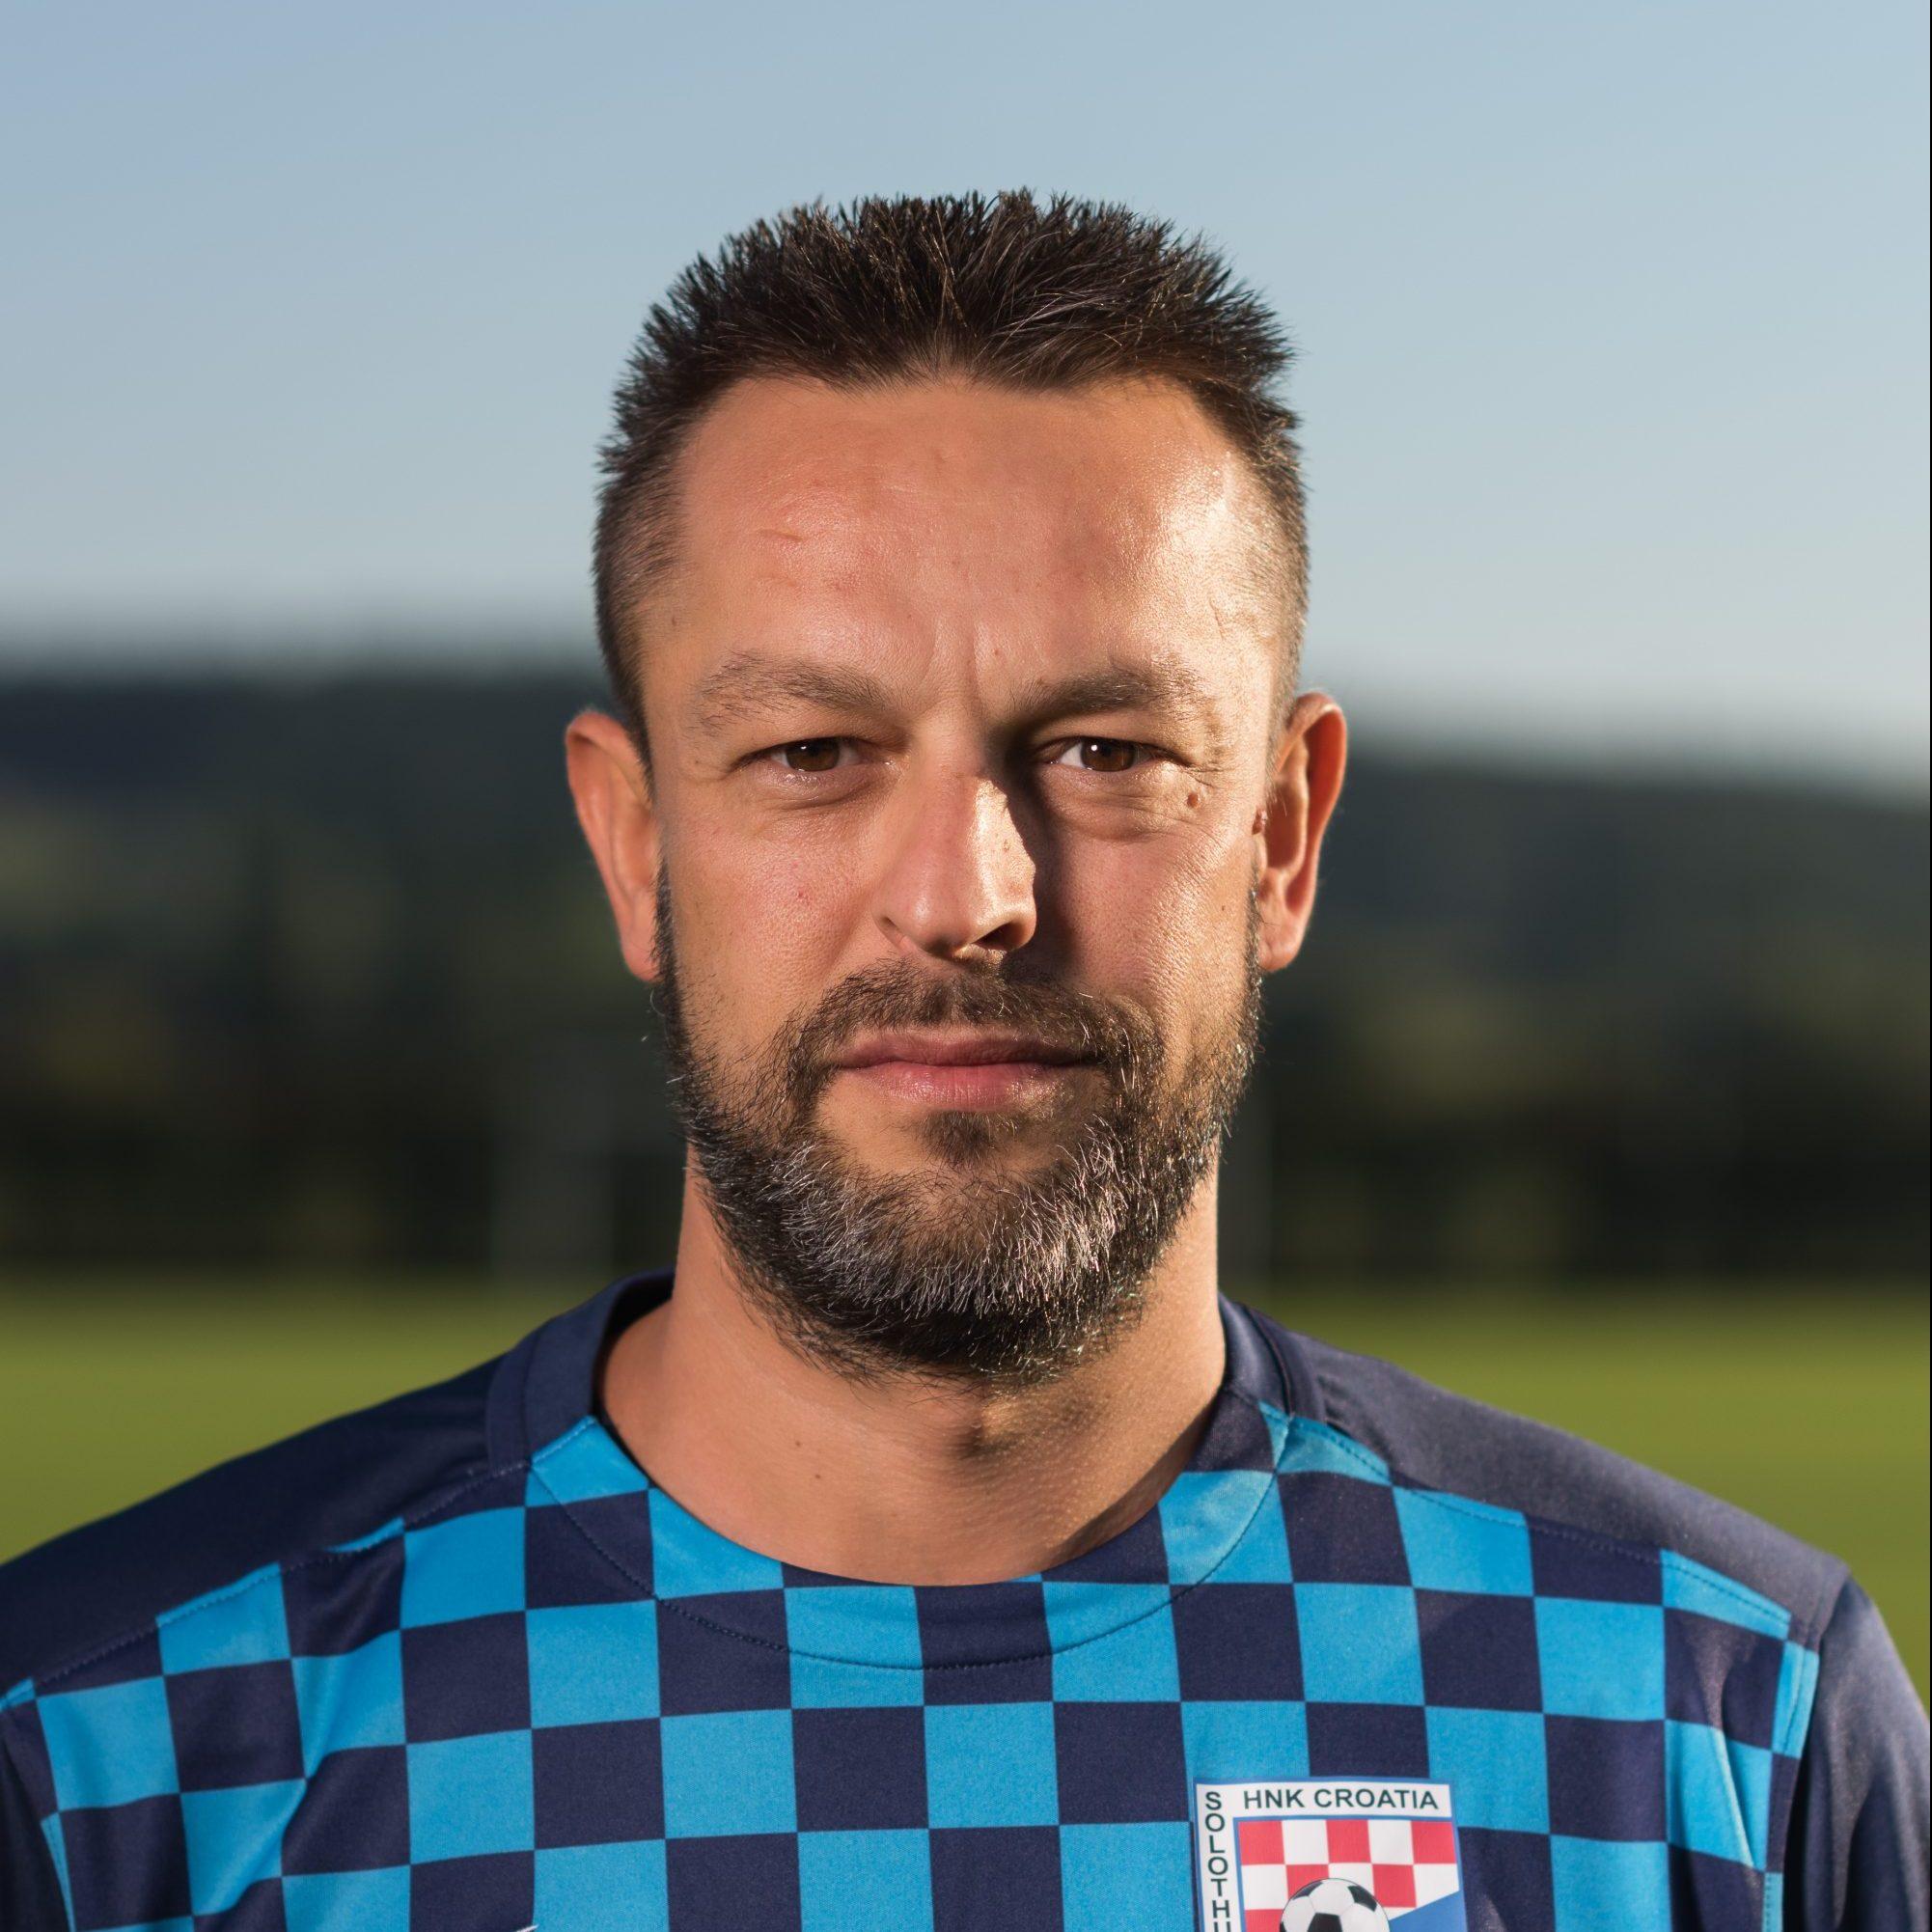 Zrinko Ravlija - Junior Obmann